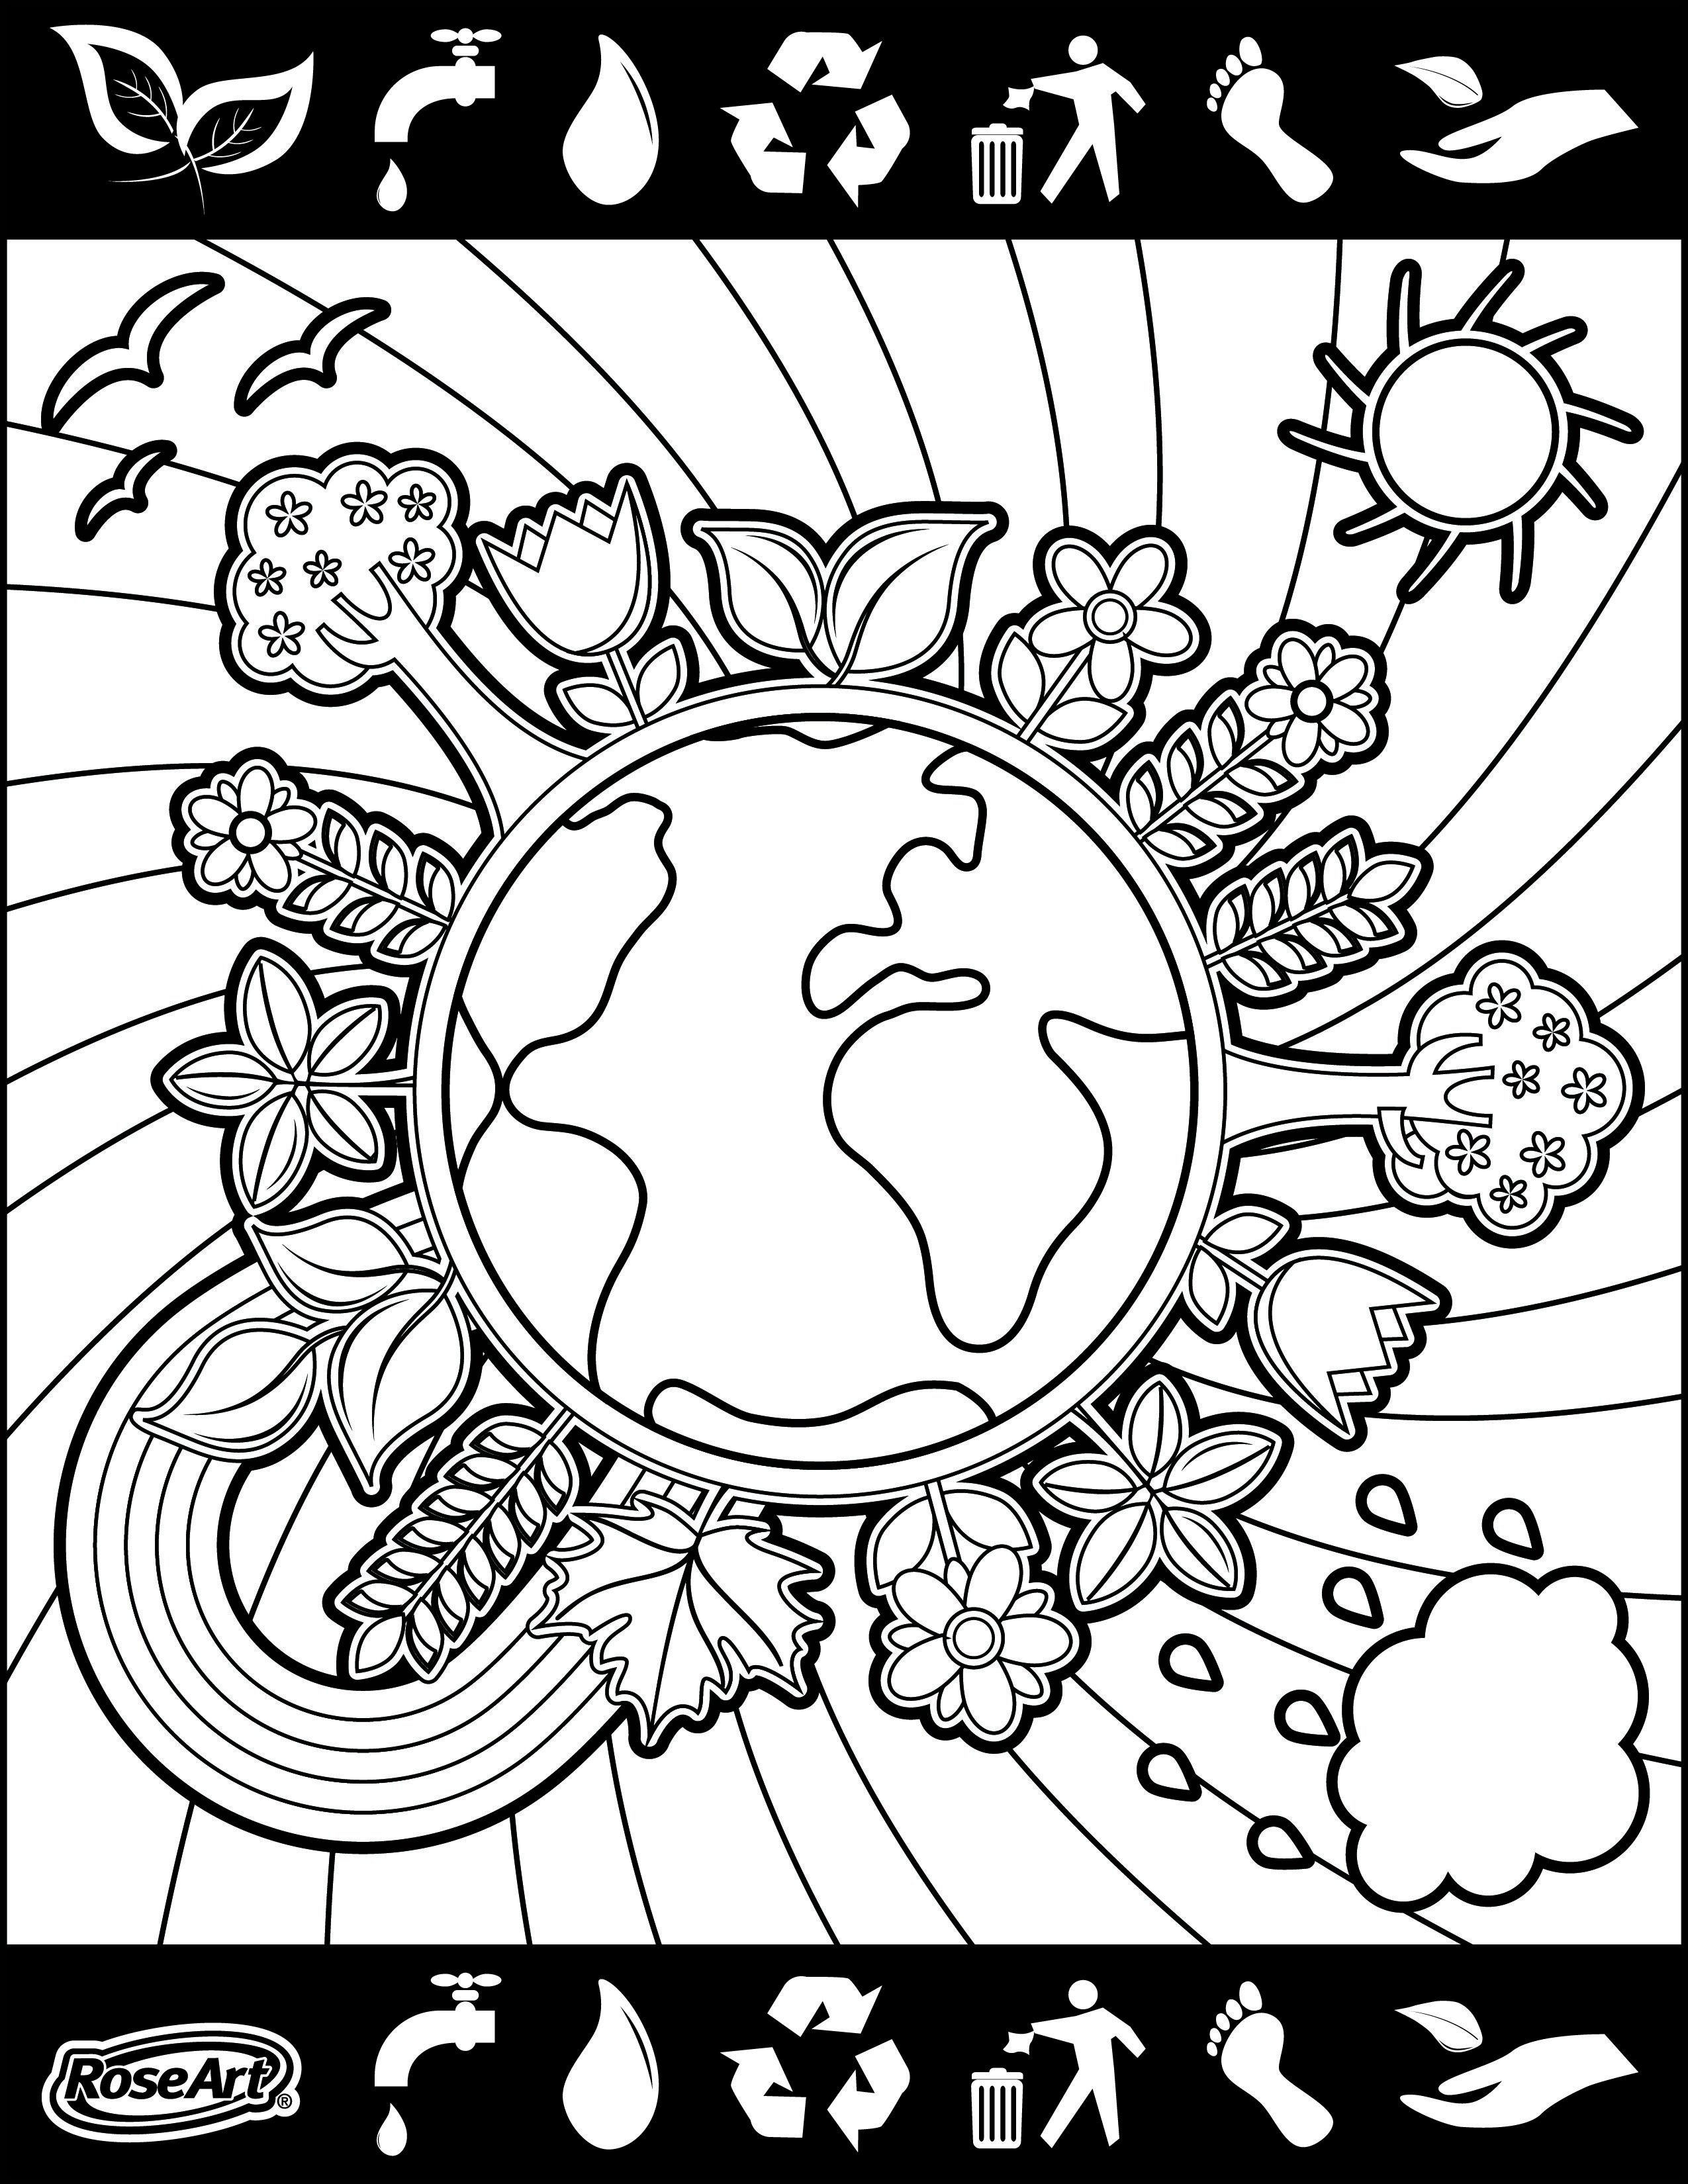 Environmental coloring activities - Activities